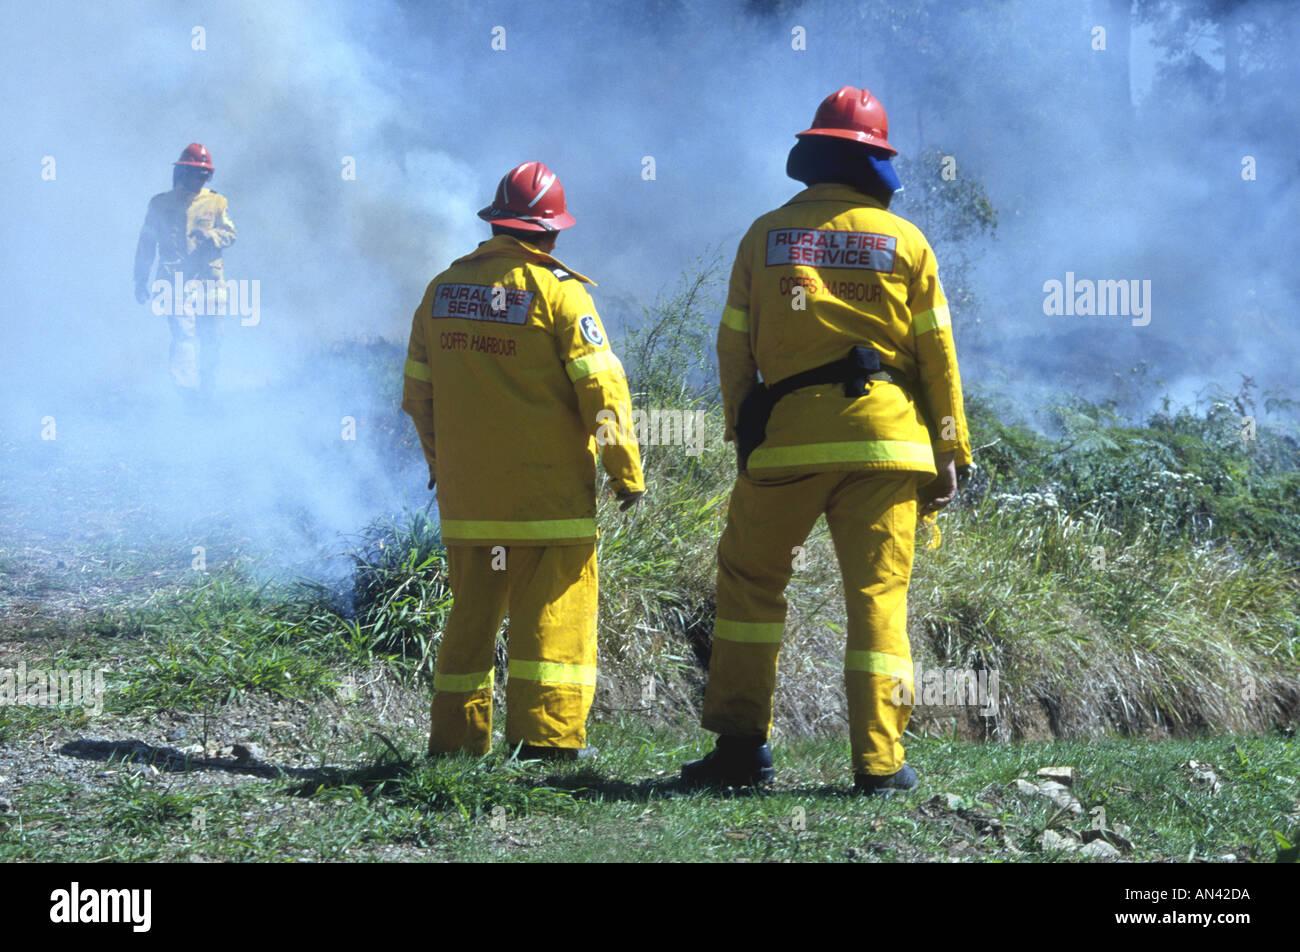 Volunteer Rural Fire Service Firefighters at a bushfire, Australia. - Stock Image